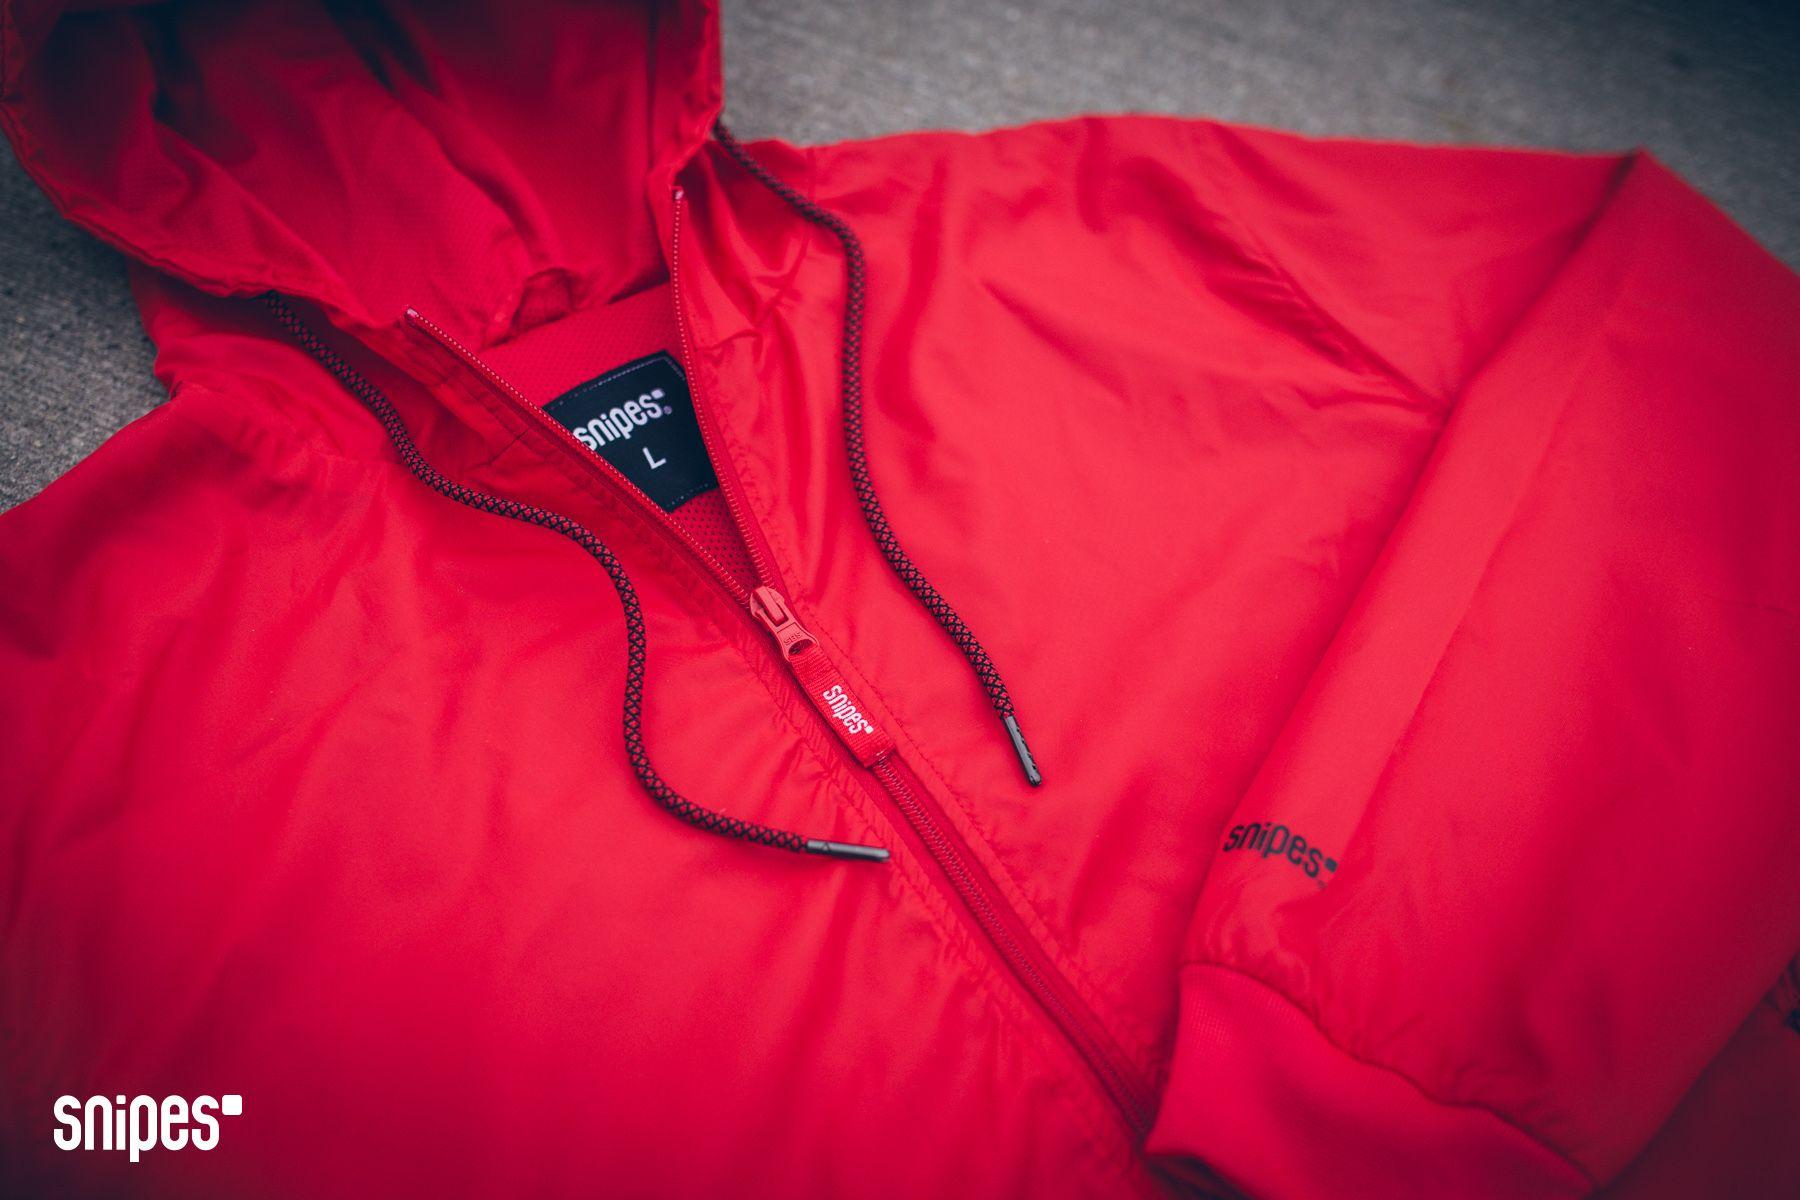 SNIPES Windbreaker #allredeverything #streetwear #red #redjacket